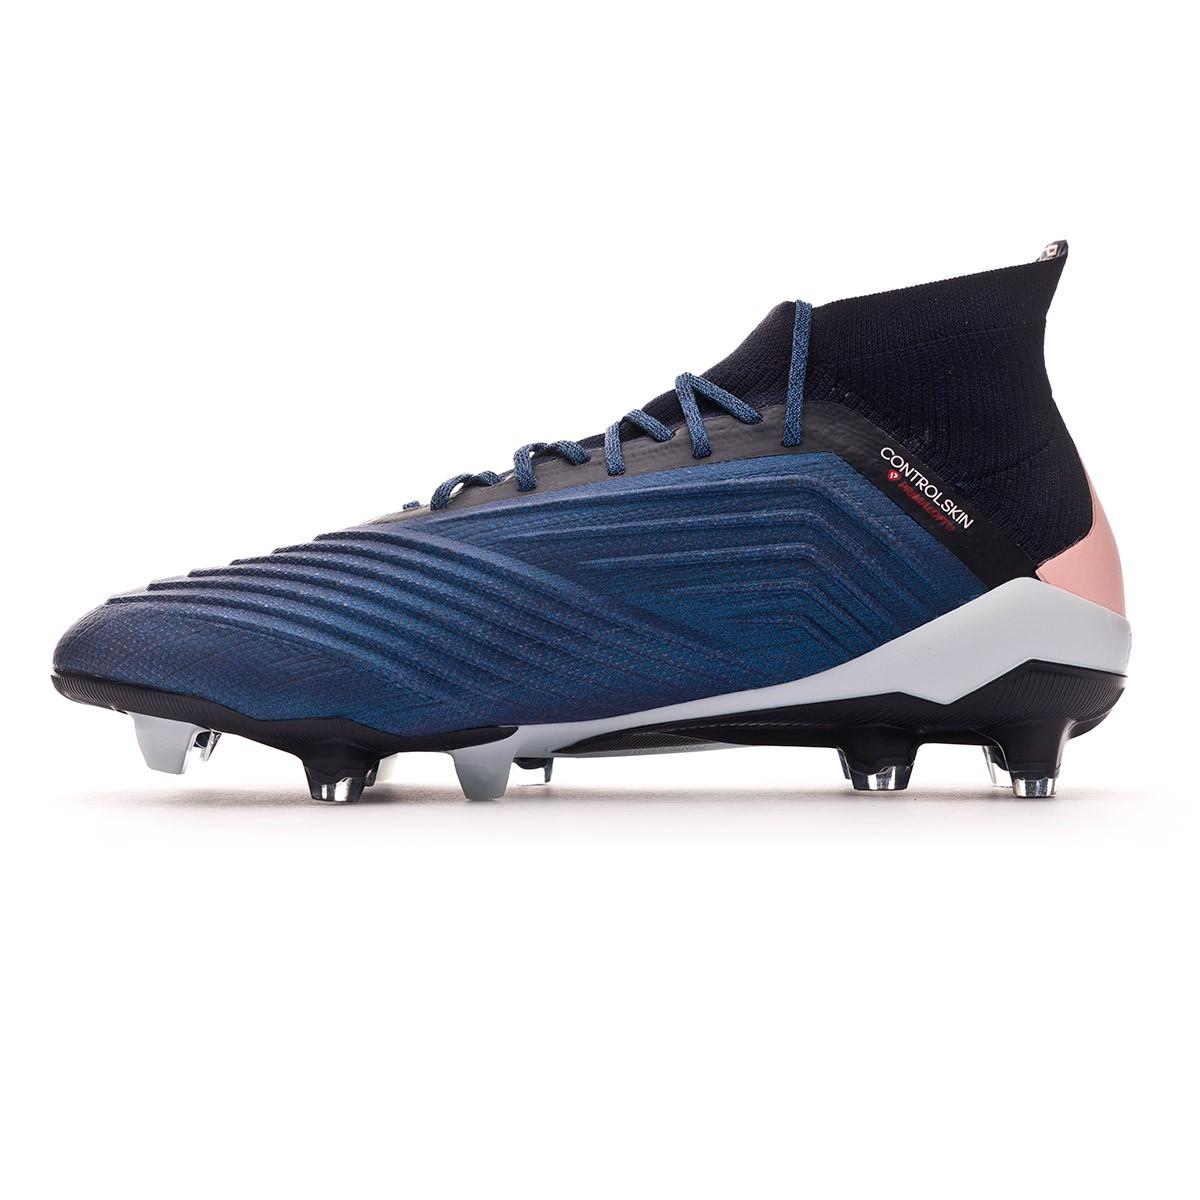 wholesale dealer 1ef6d b4d9d Bota de fútbol adidas Predator 18.1 FG Trace blue-Legend ink-Clear orange -  Soloporteros es ahora Fútbol Emotion